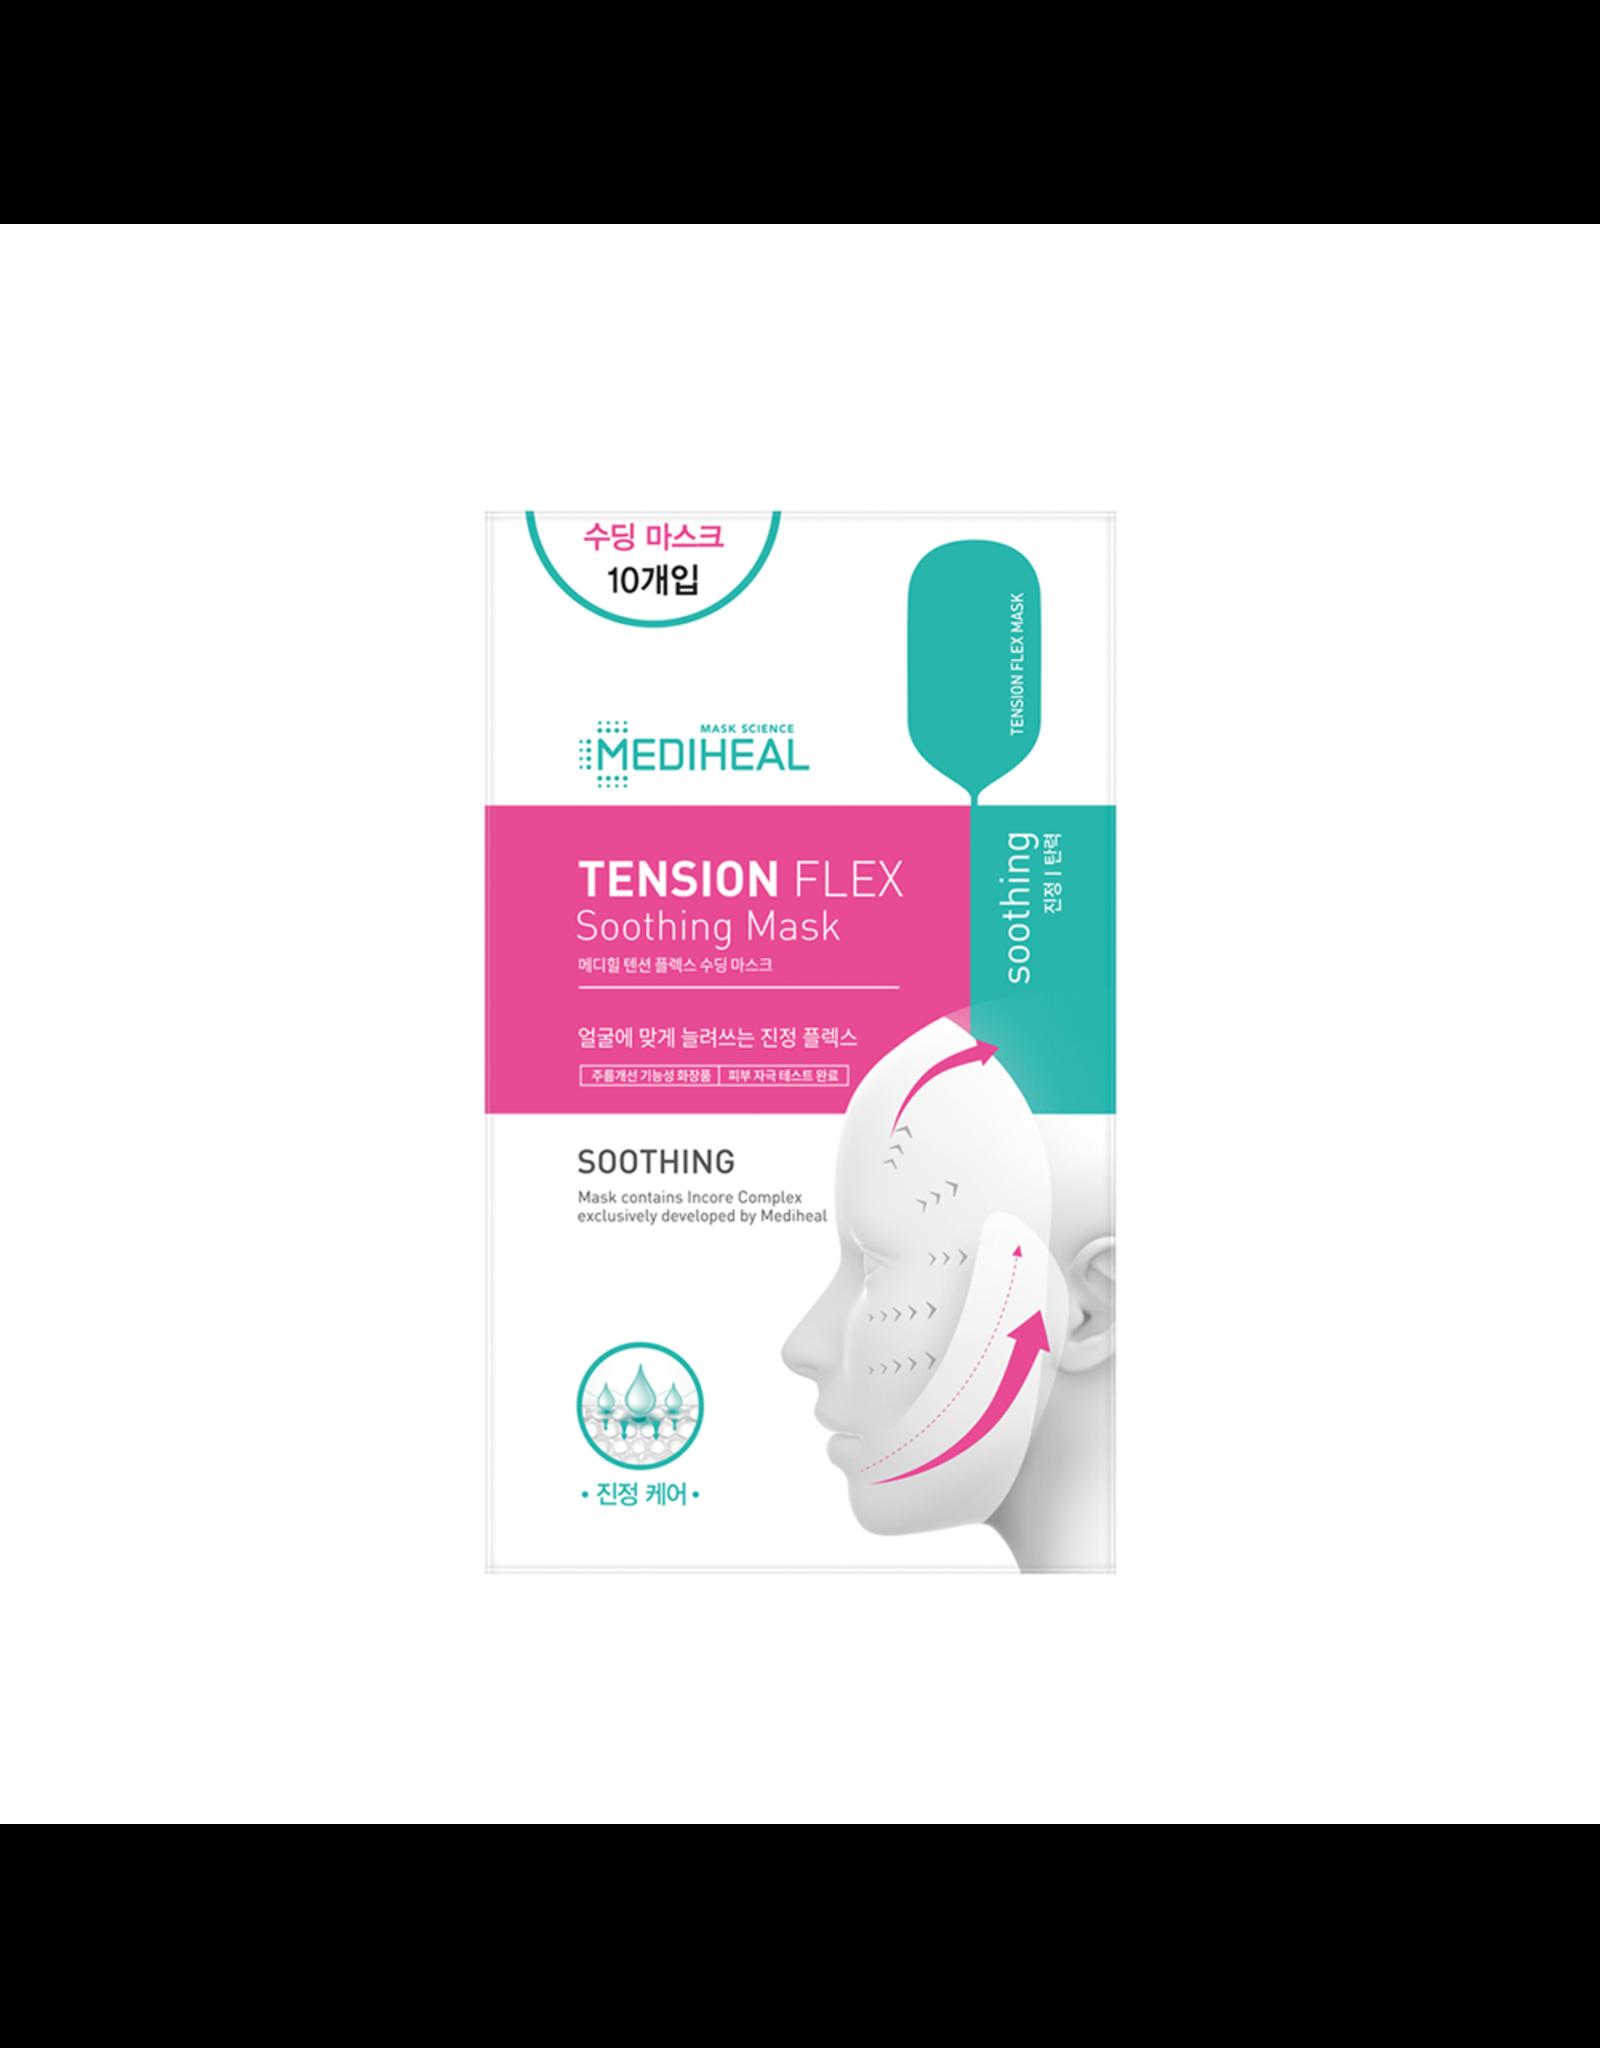 Mediheal Mediheal Tension Flex Soothing Mask Box